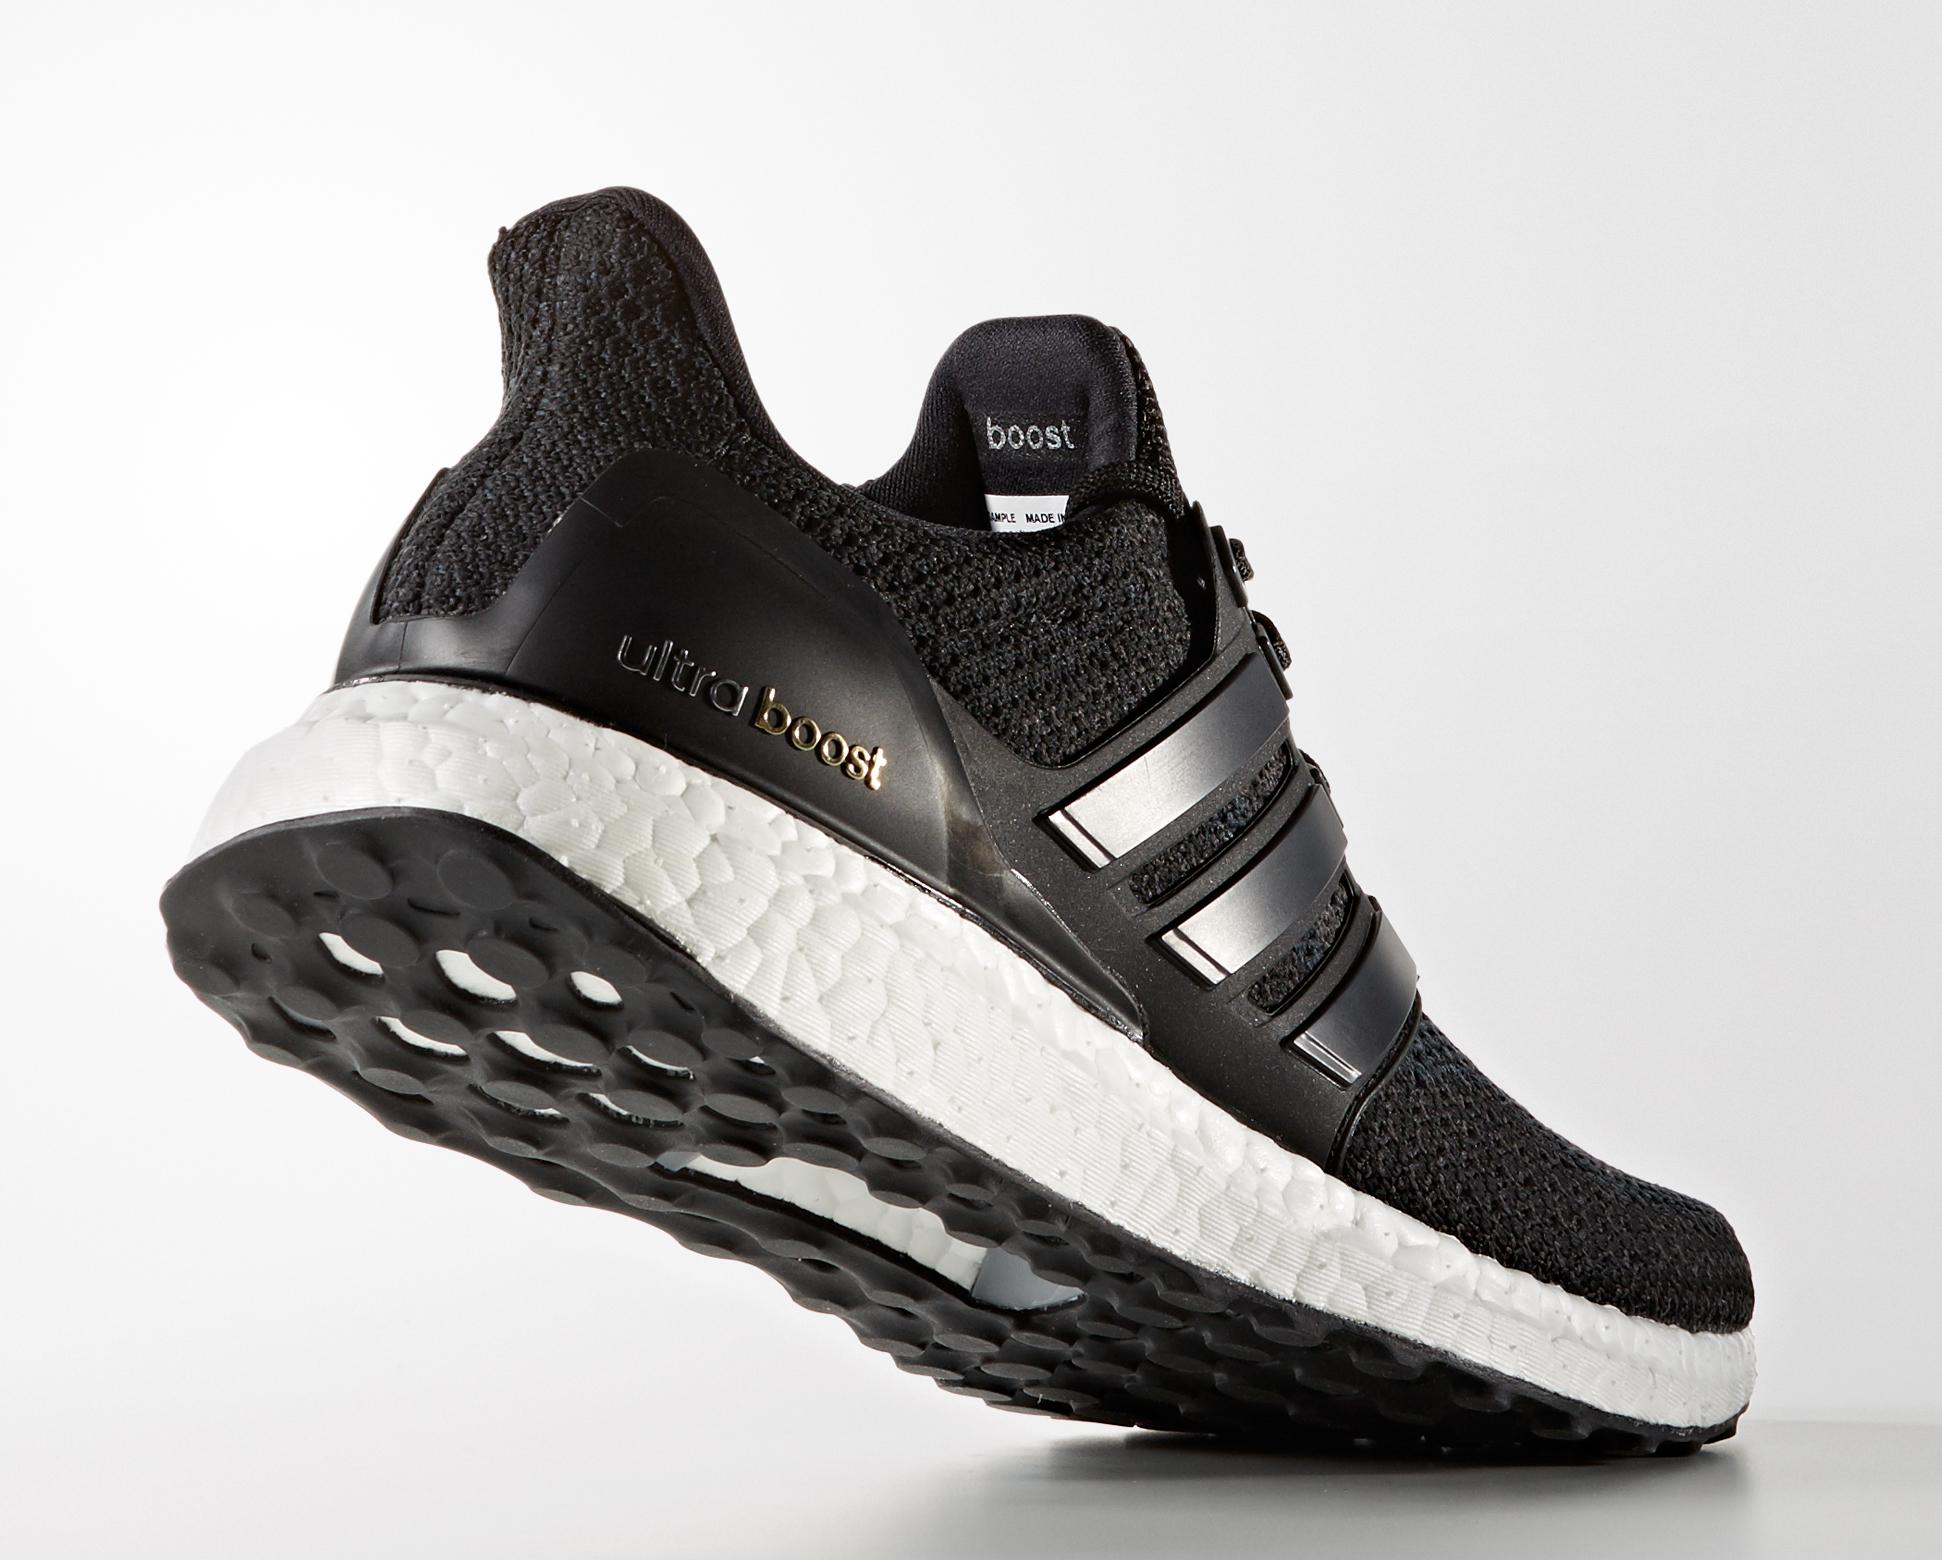 49edfd578d93 Adidas UltraBoost Road Running Shoes - Women s